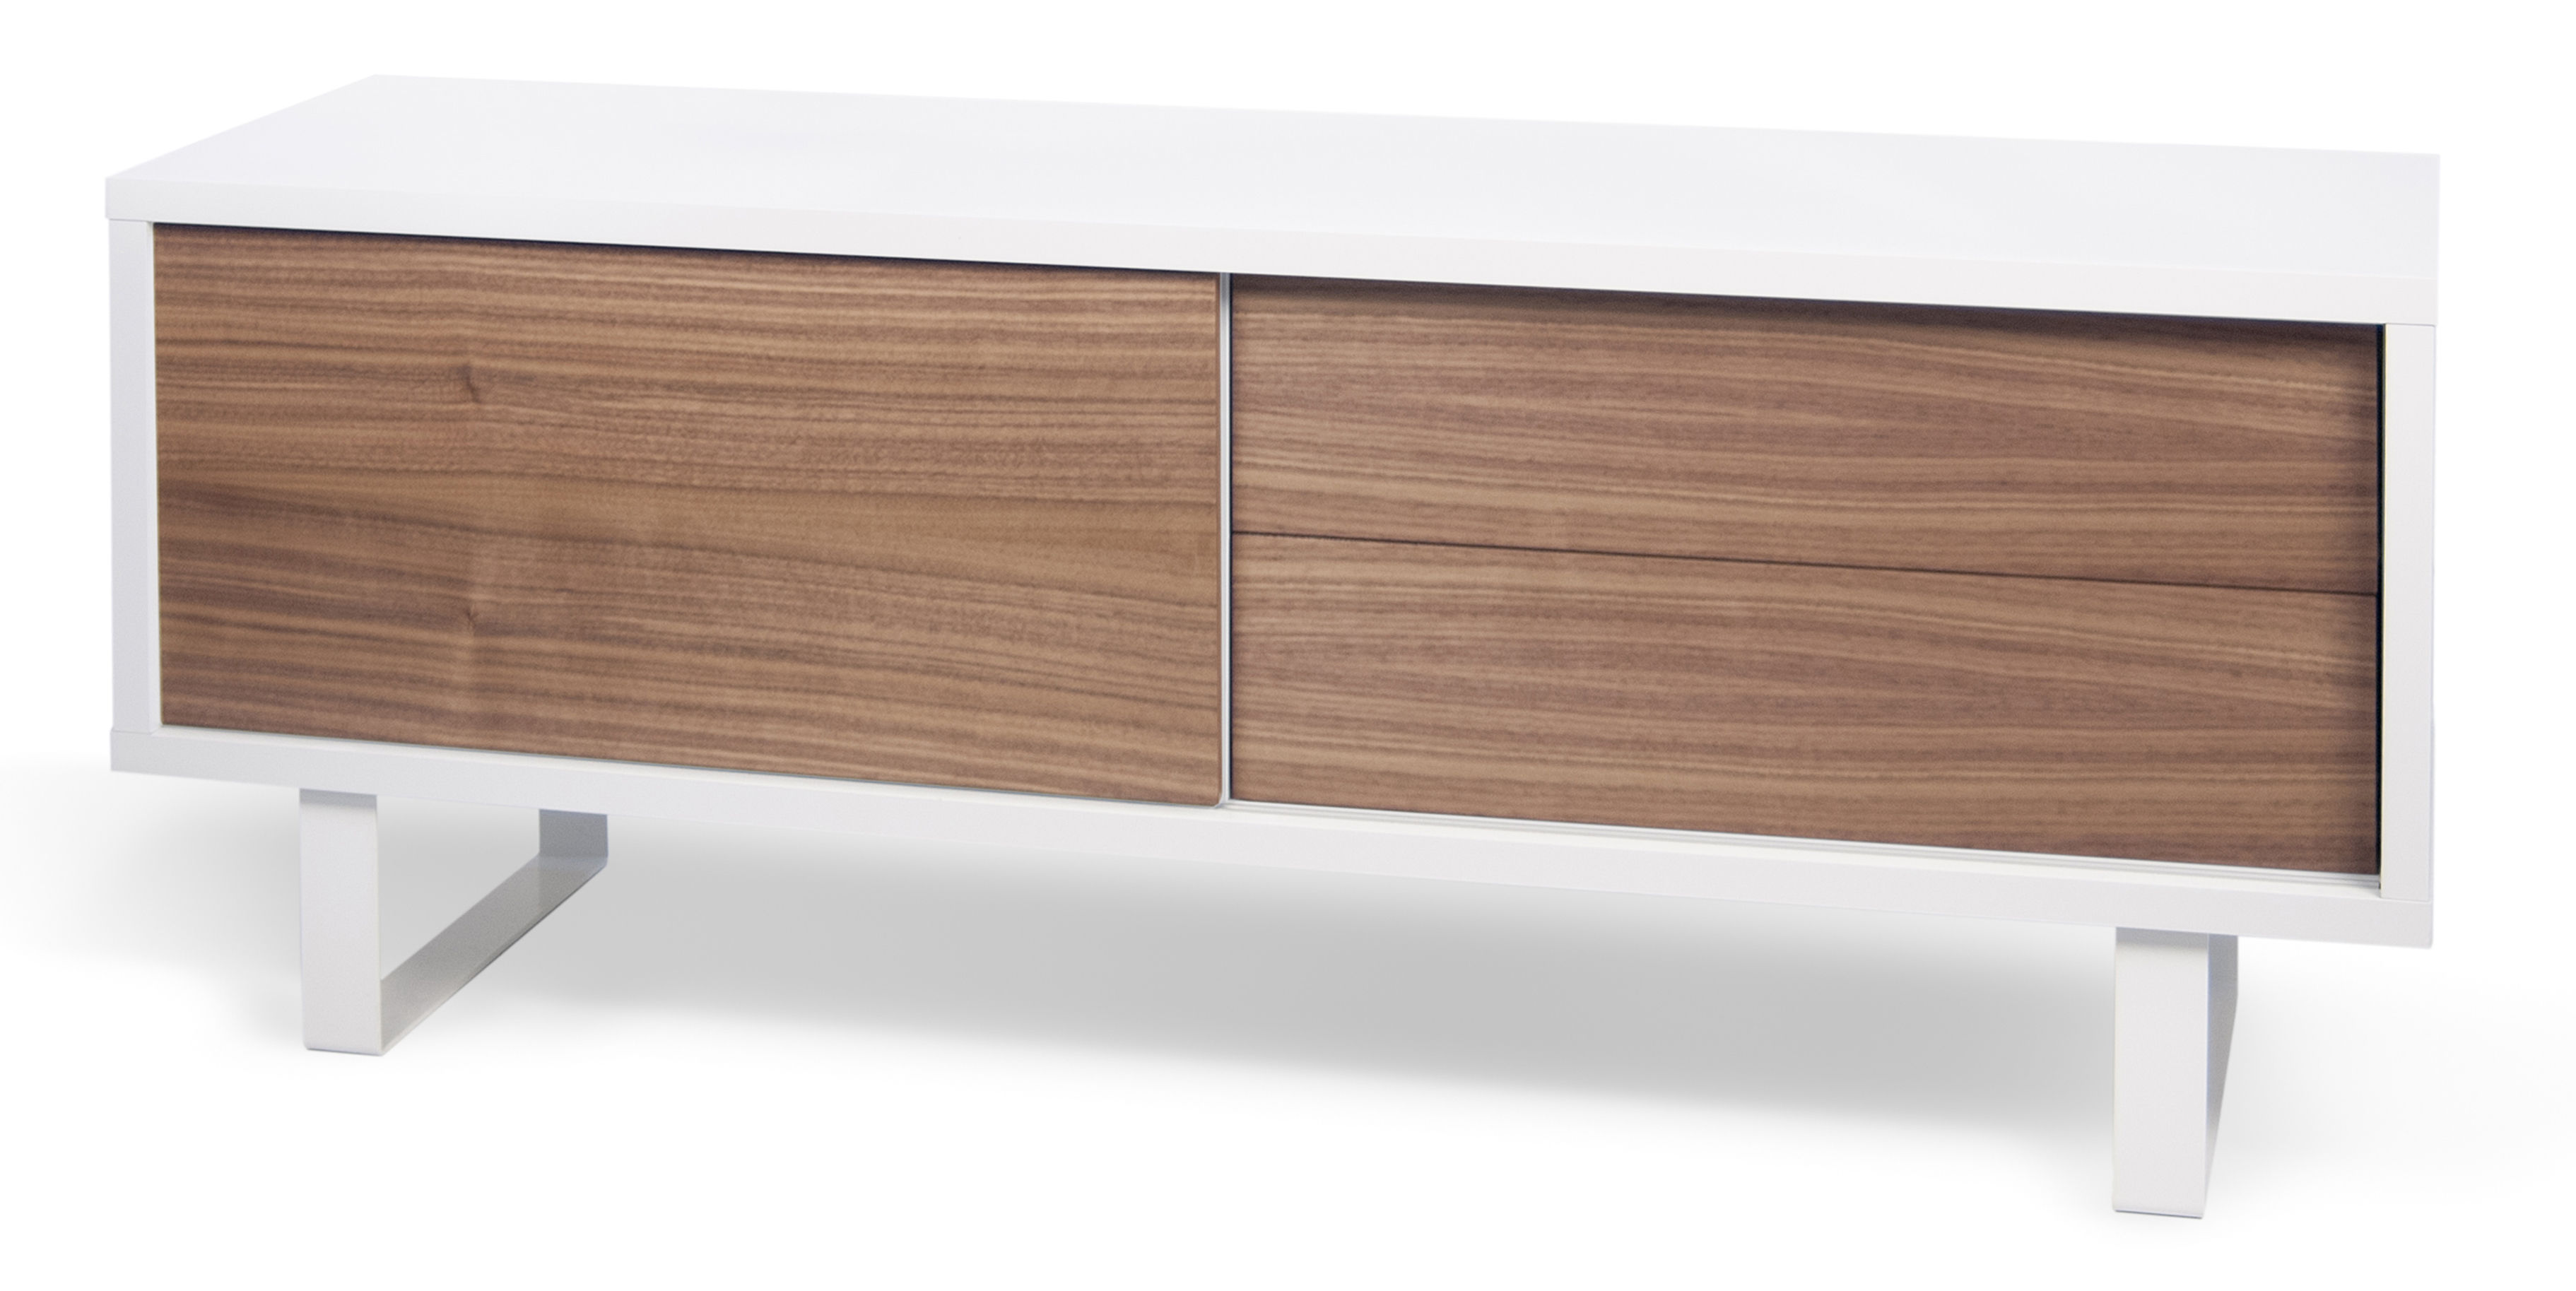 buffet oslo l 150 cm blanc noyer pop up home made in design. Black Bedroom Furniture Sets. Home Design Ideas